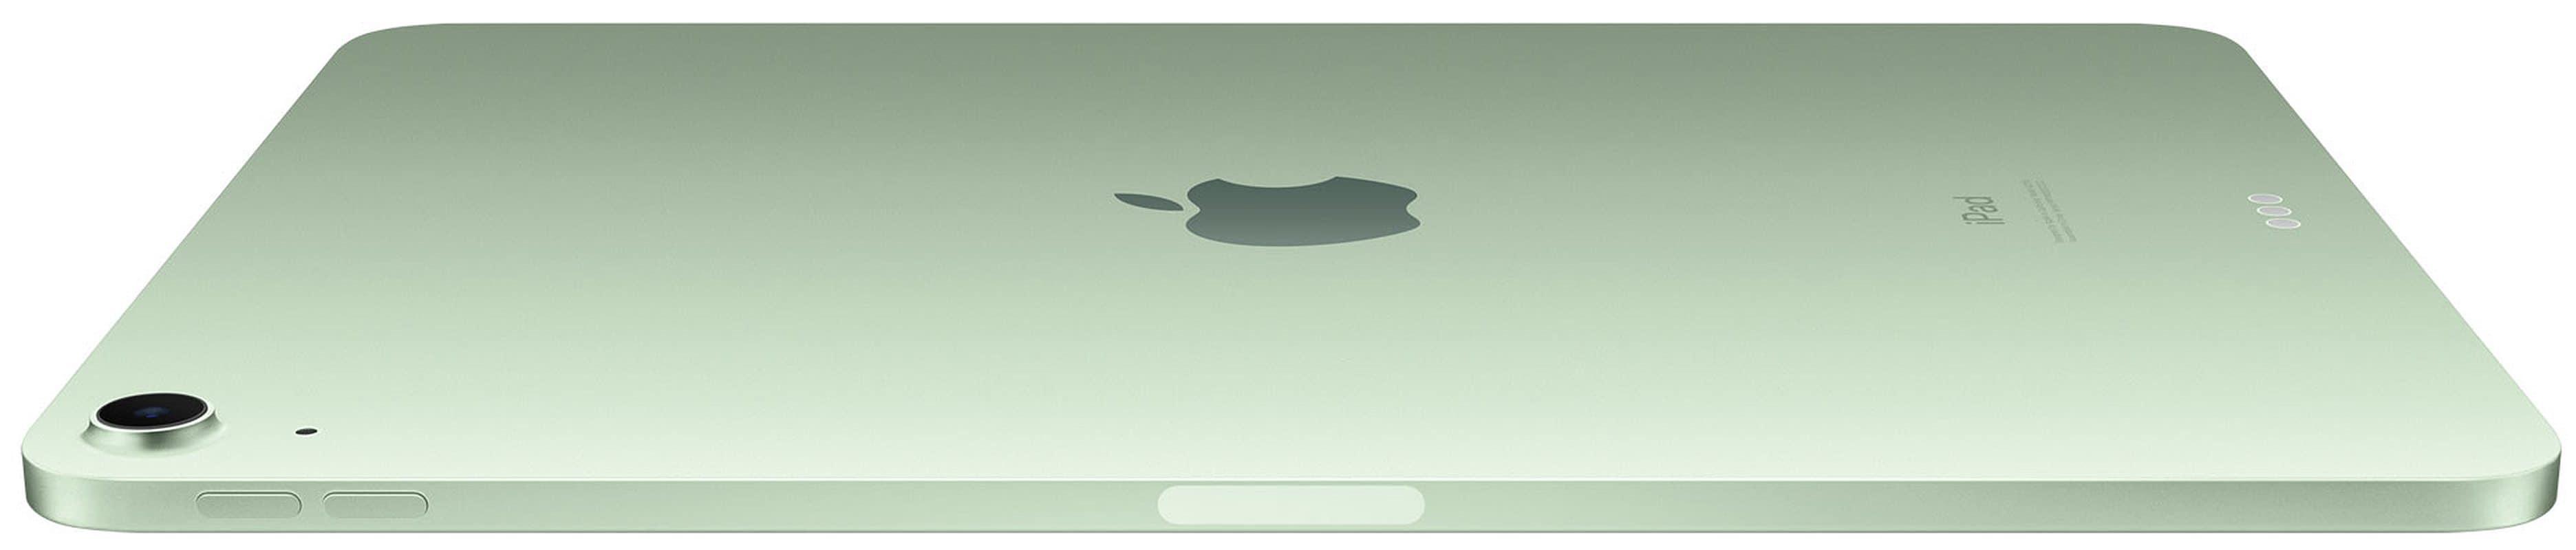 Apple iPad Air (2020) Wi-Fi + Cellular Price ...